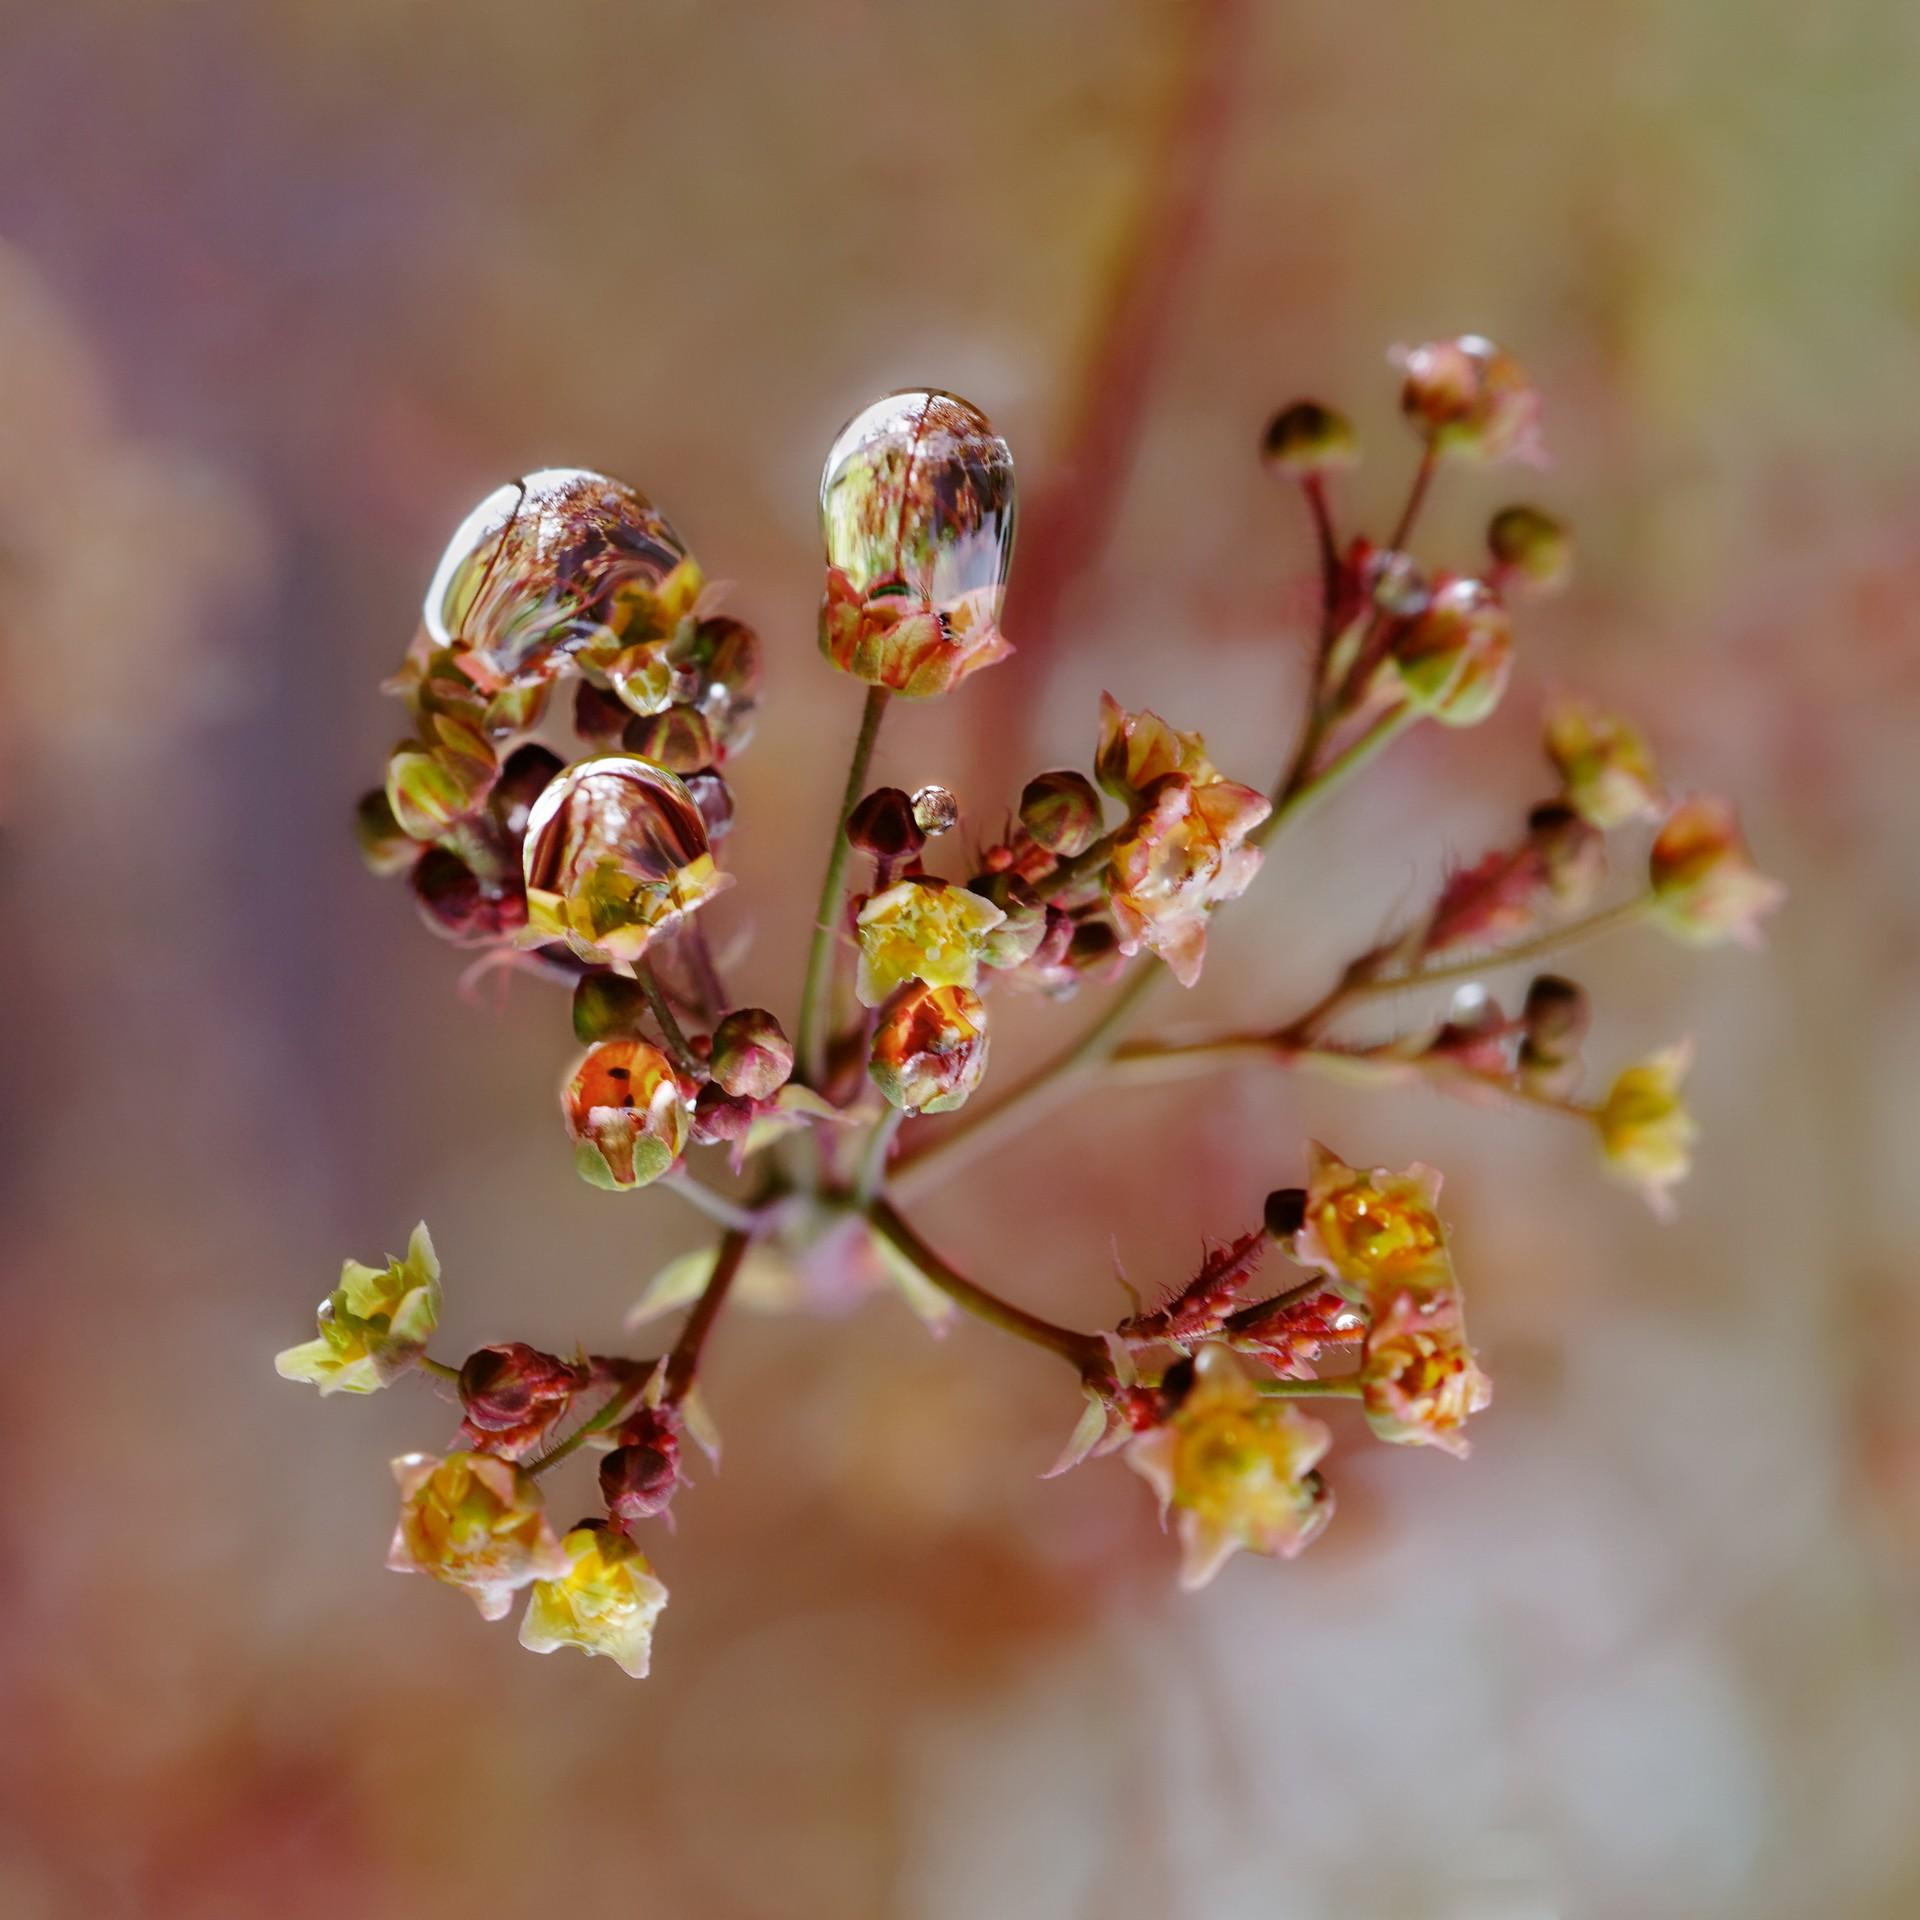 00 fleurspluie catalogue 4